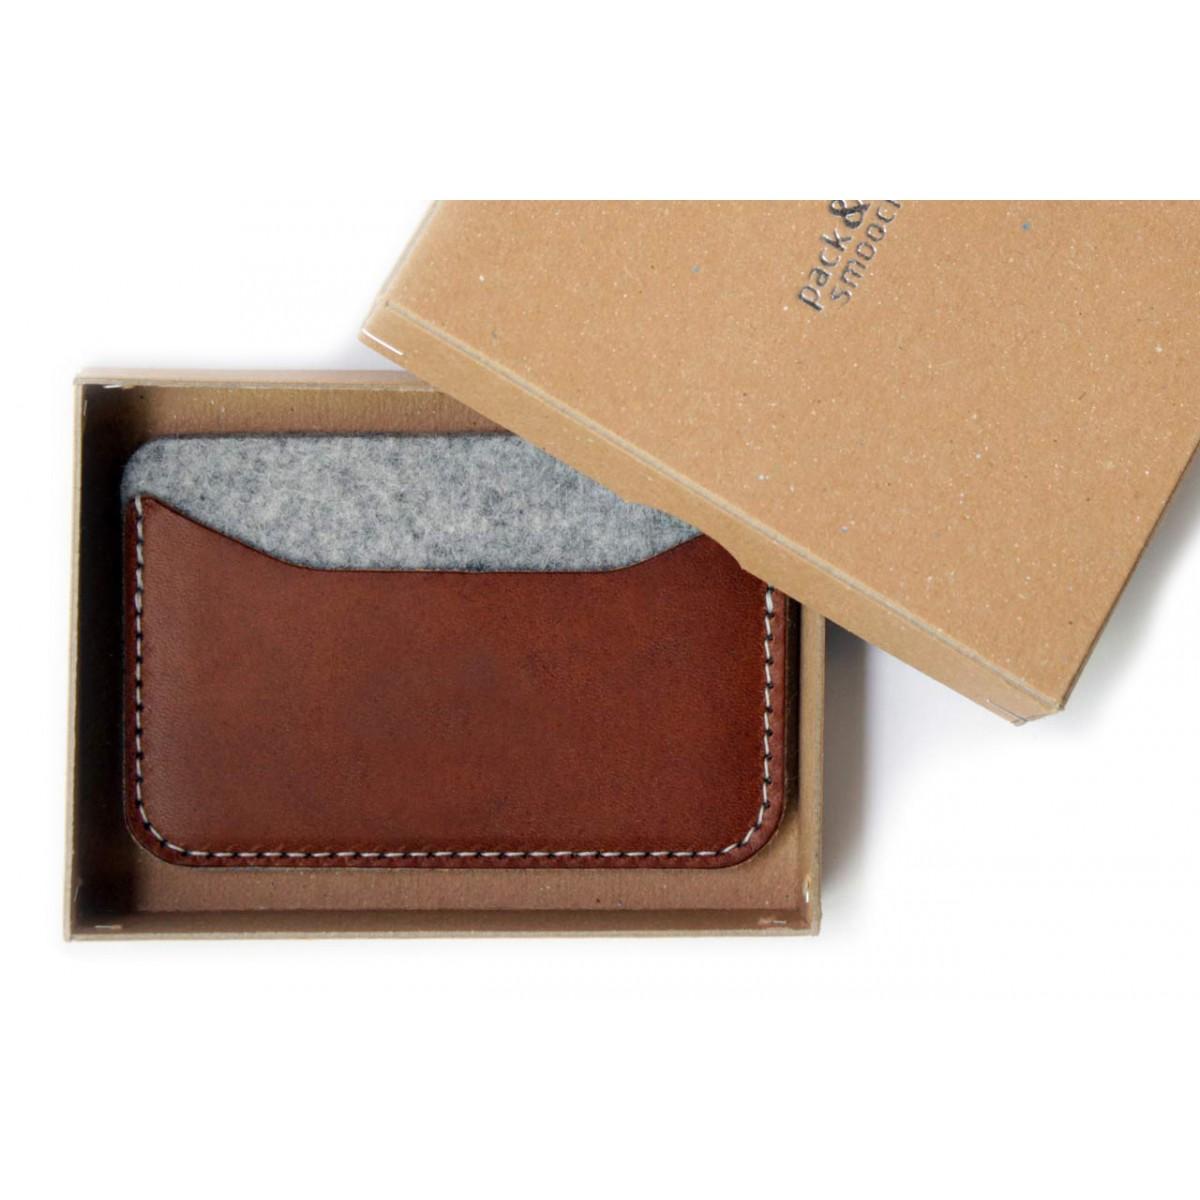 Kartenetui, Portemonnaie KESWICK - Pflanzlich gegerbtes Leder, 100% Wollfilz